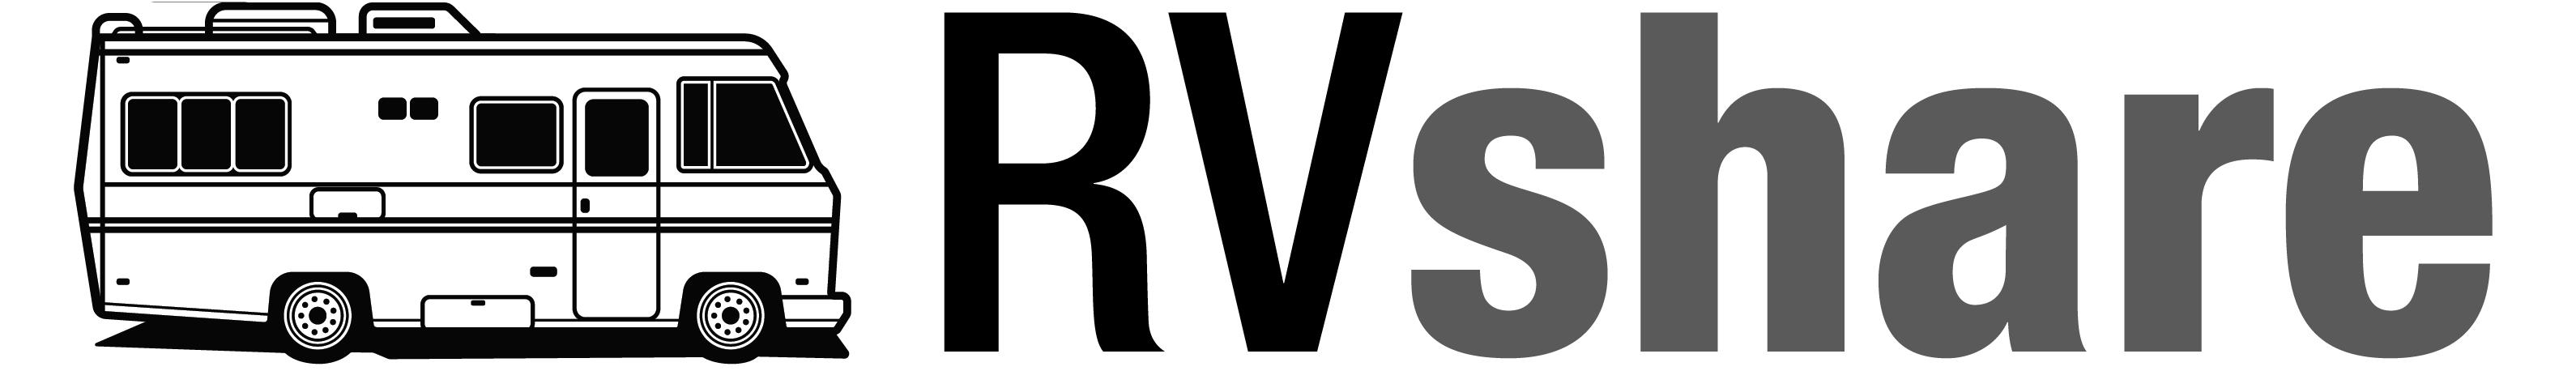 RVshare-Camper-Rental-Company-Logo.png